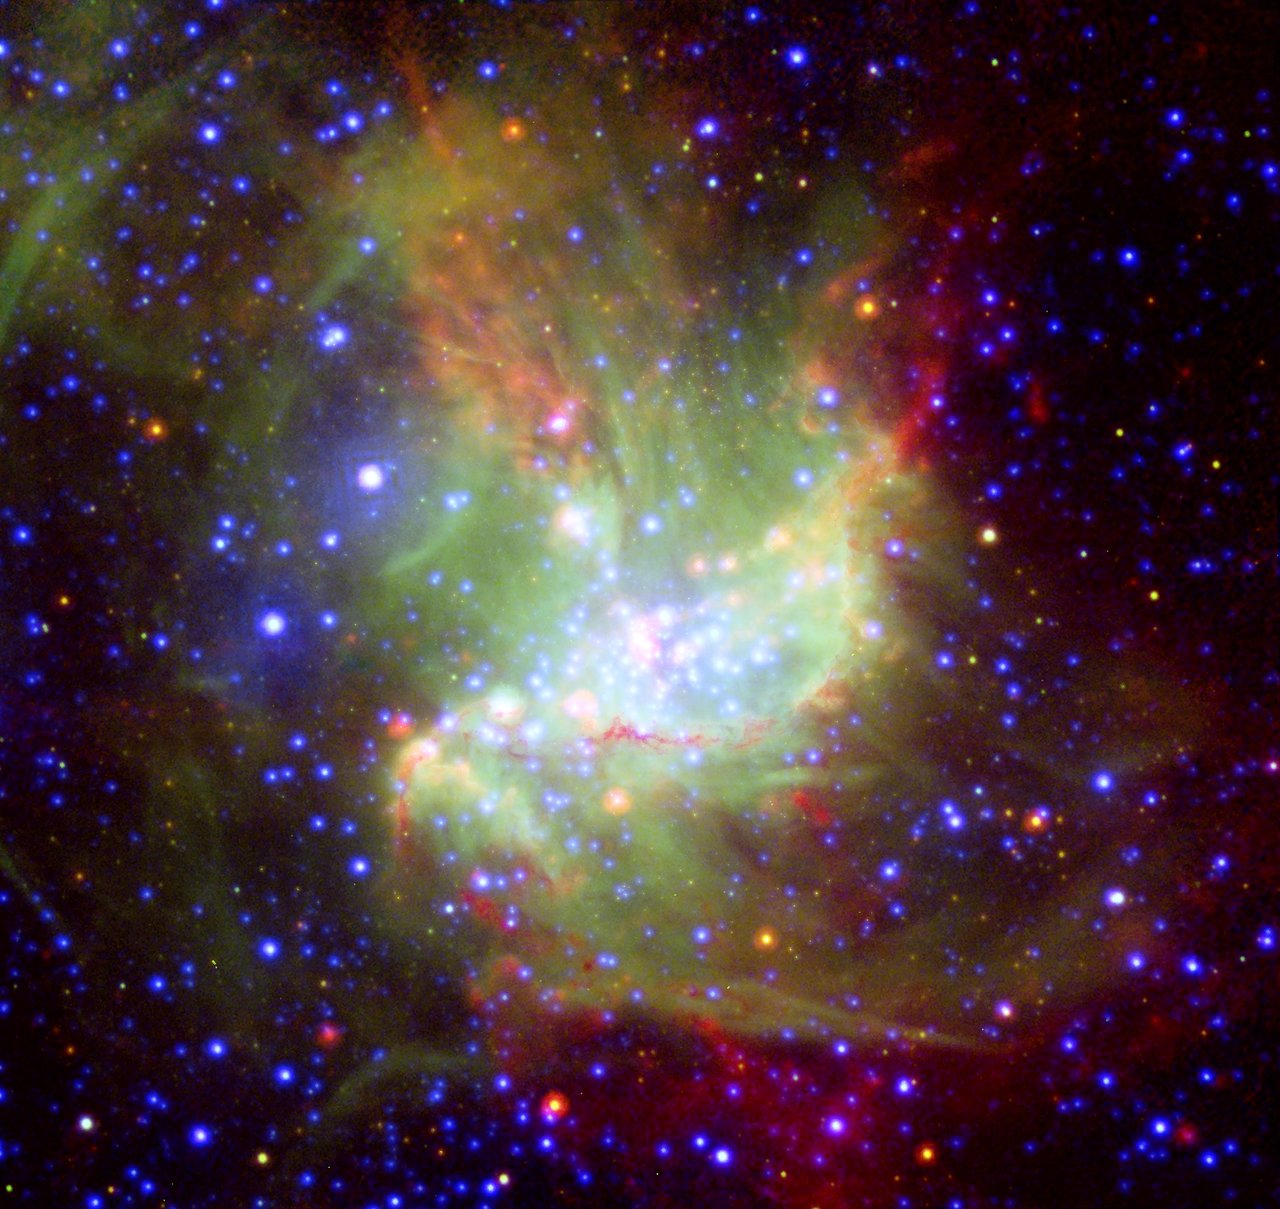 Star-Forming Region NGC 346